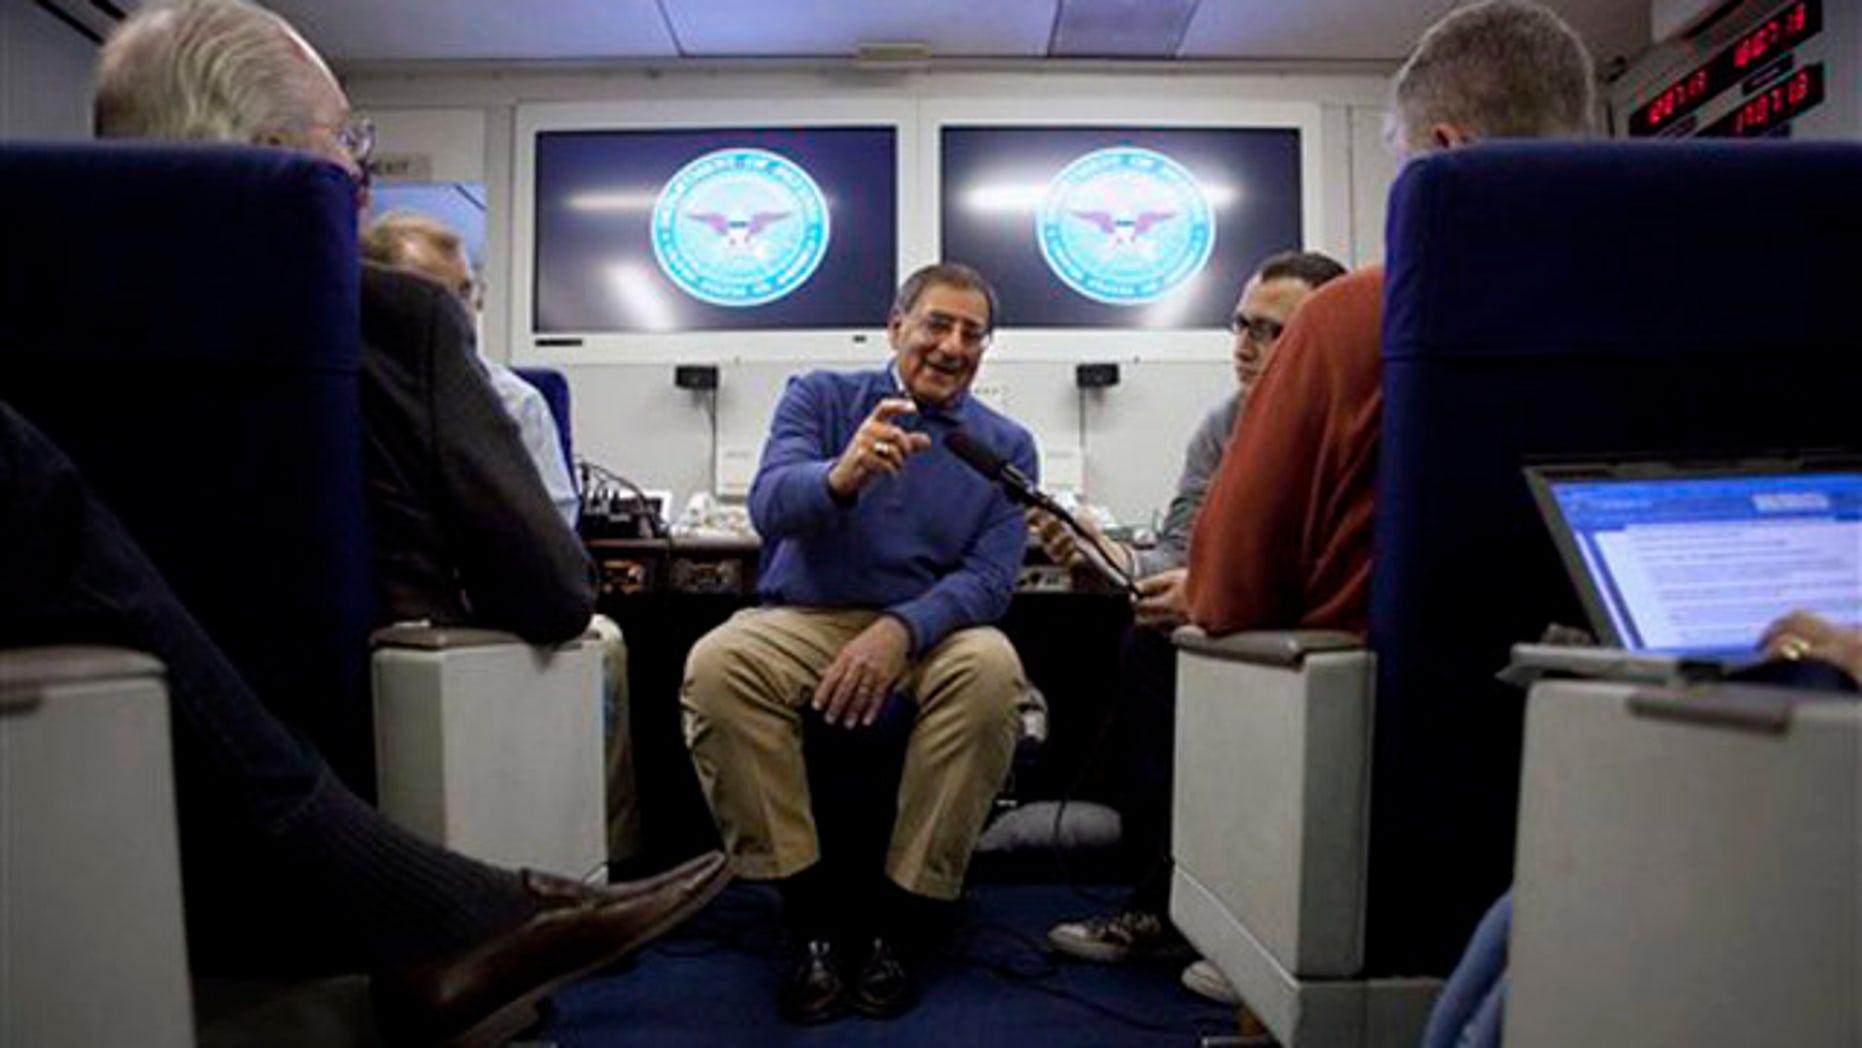 Feb. 1, 2012: Defense Secretary Leon Panetta briefs the media on board a plane en route to a NATO conference in Brussels, Belgium.